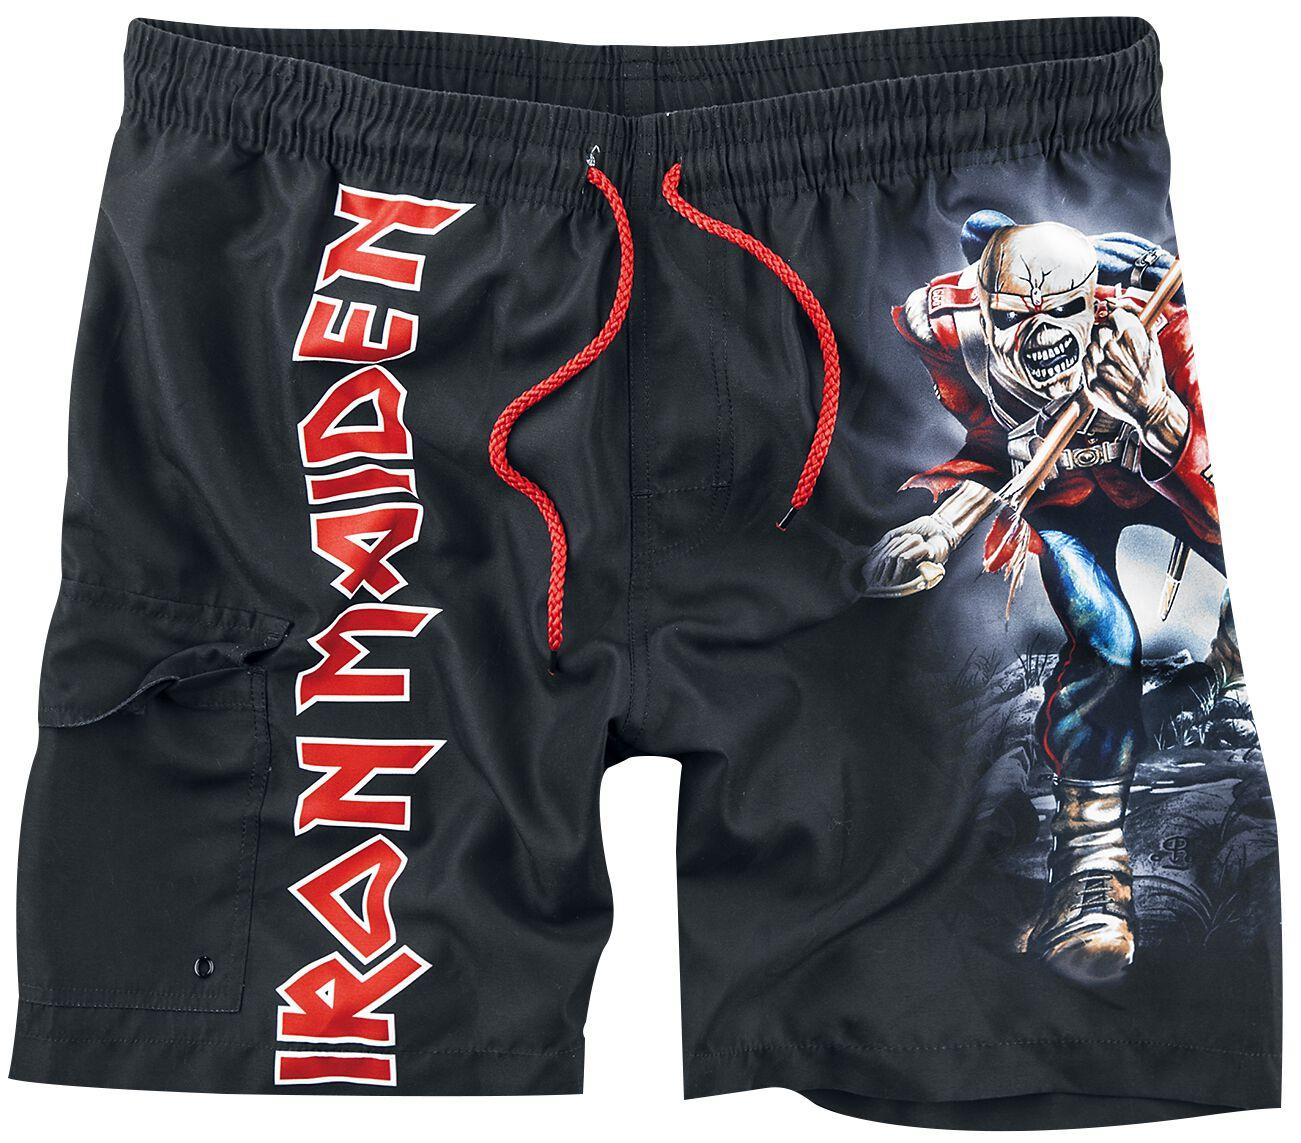 3cc8f1a99a Iron Maiden. EMP Signature Collection. Swim Shorts. 2 Reviews